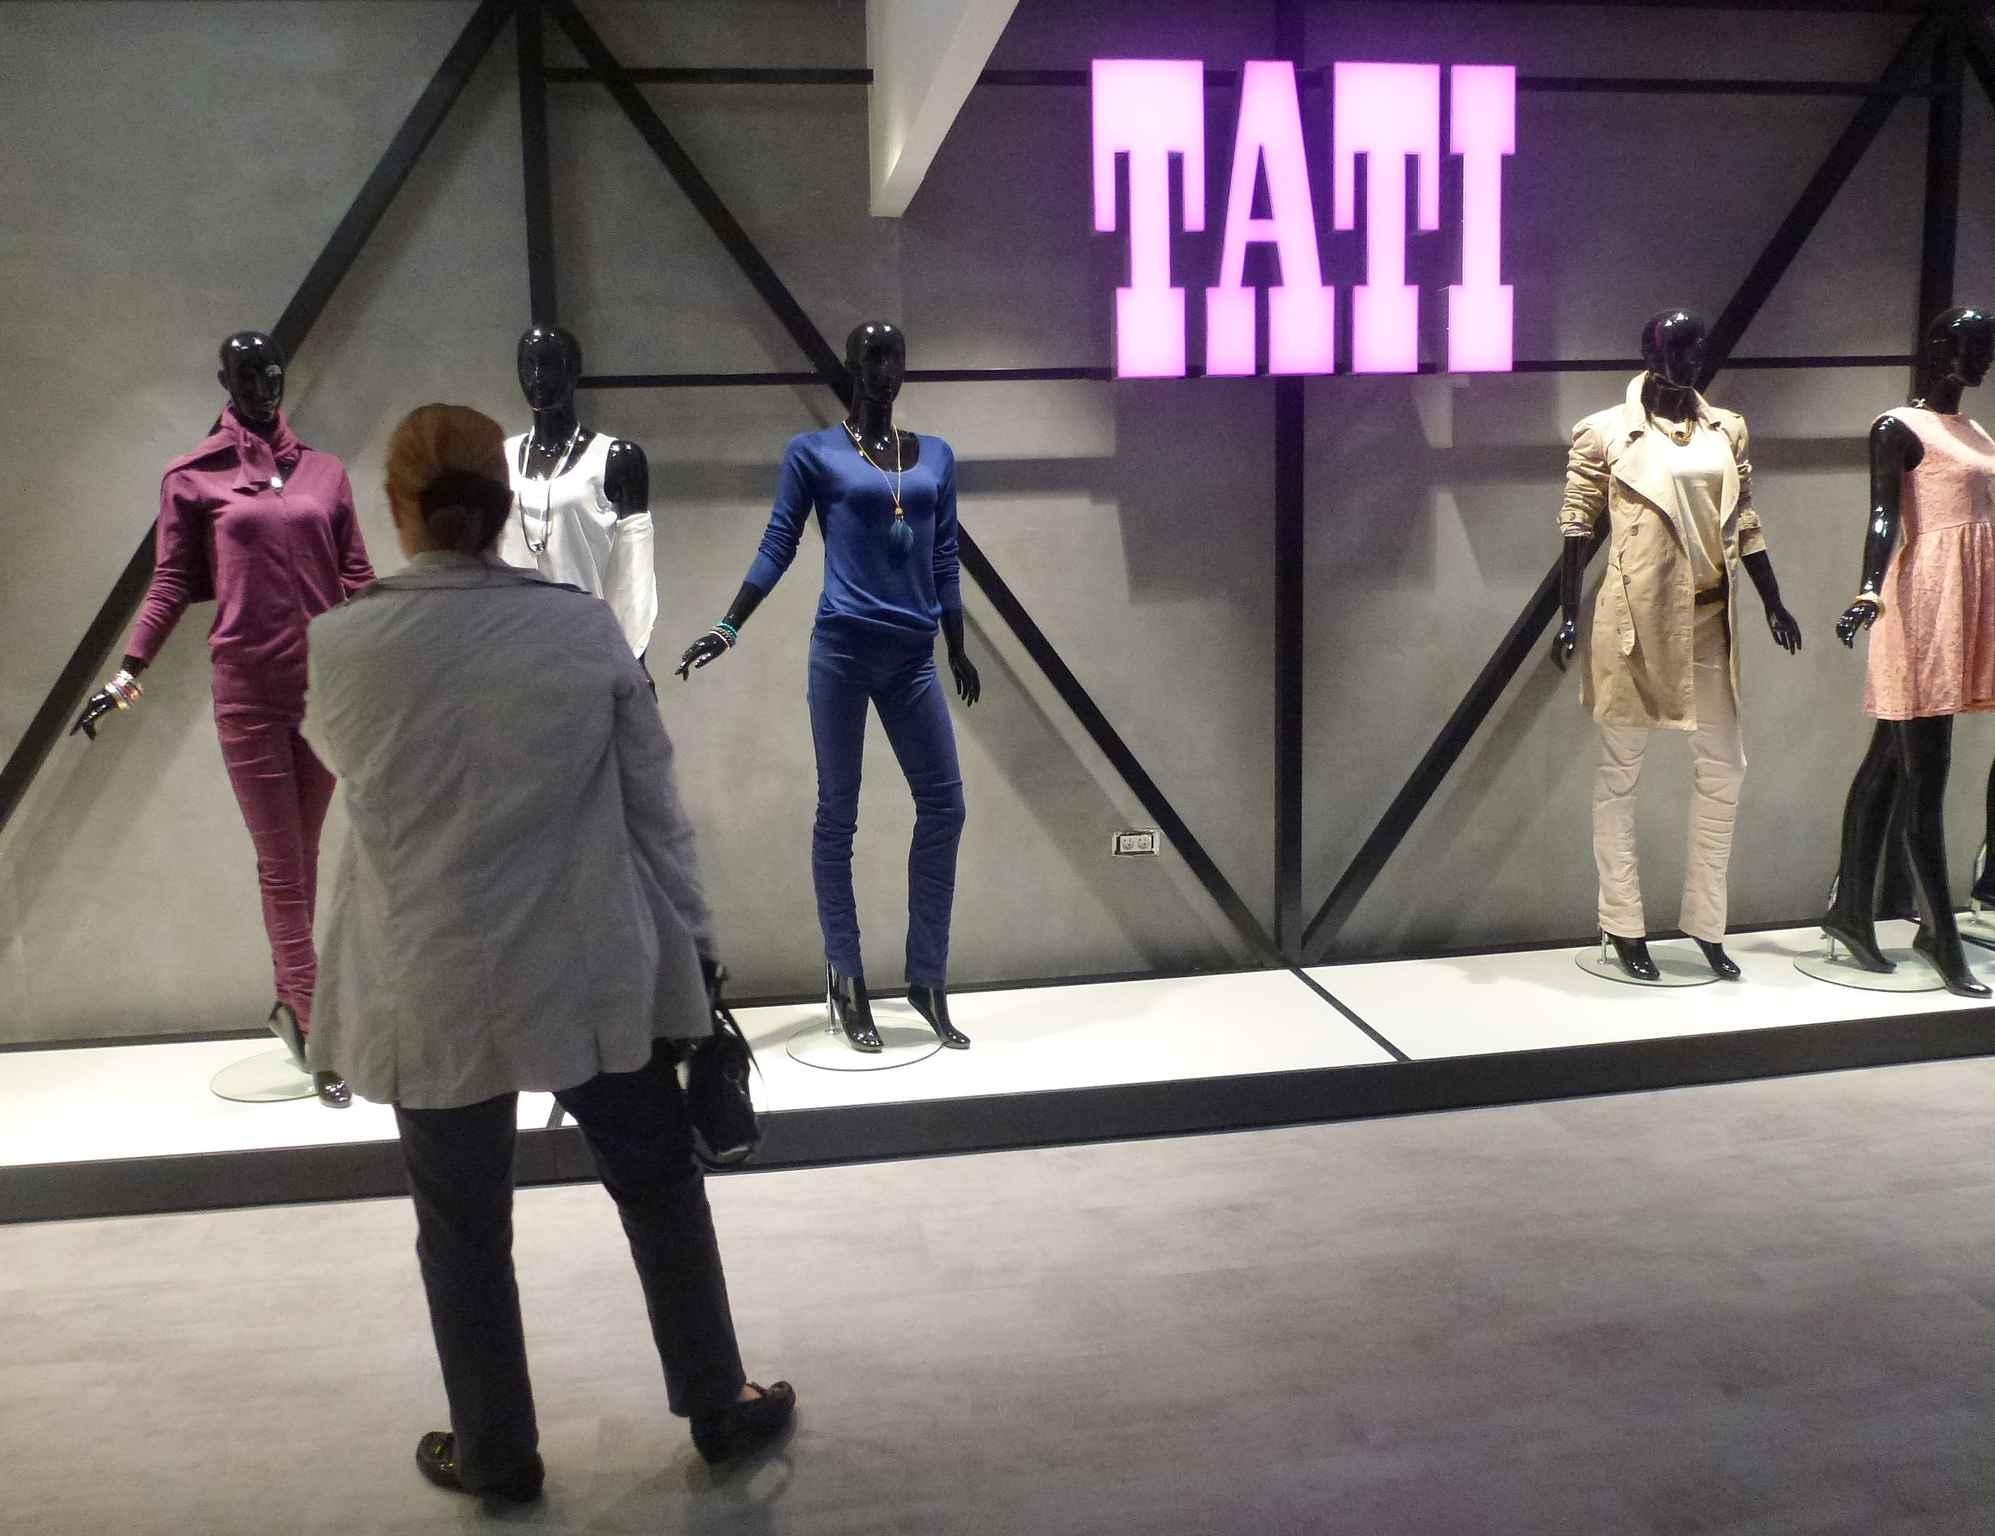 rennes tati ouvre ses portes dans le centre ville. Black Bedroom Furniture Sets. Home Design Ideas